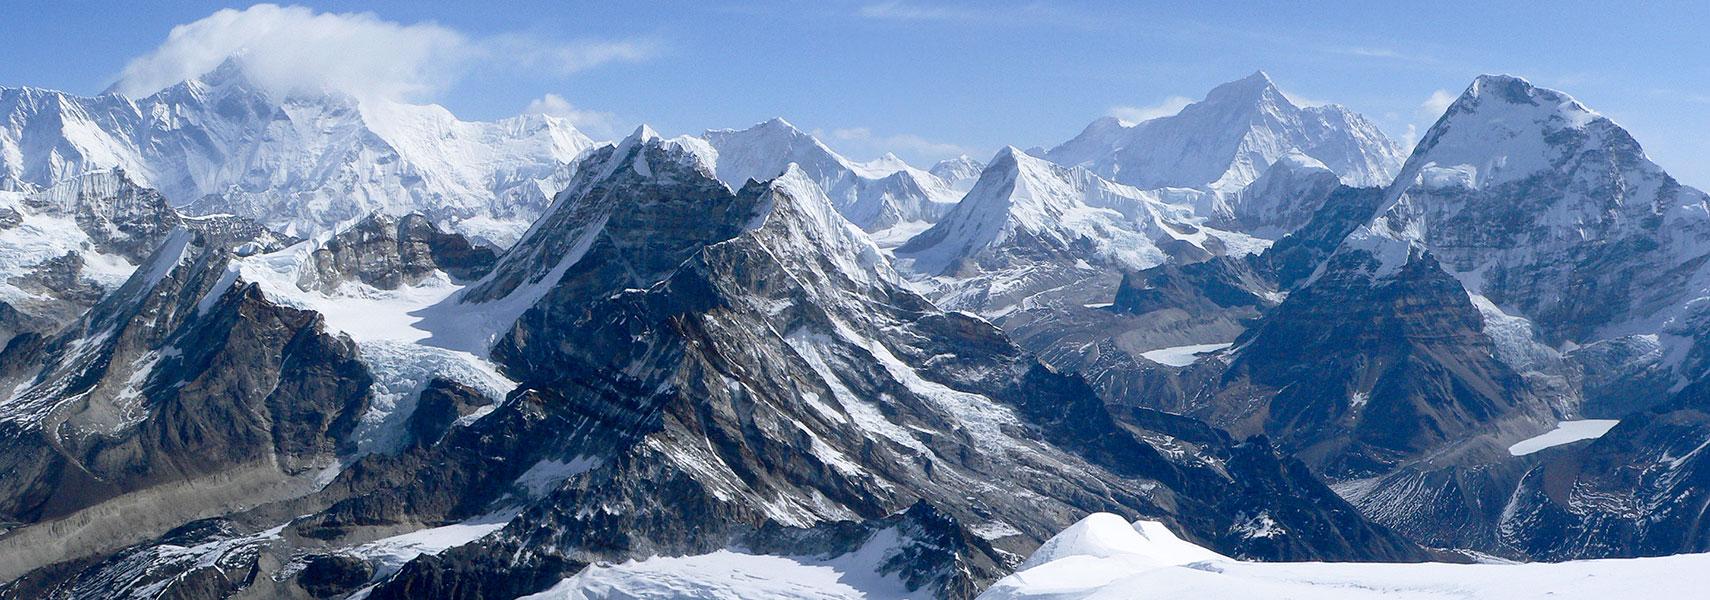 Scenic Tour of Nepal